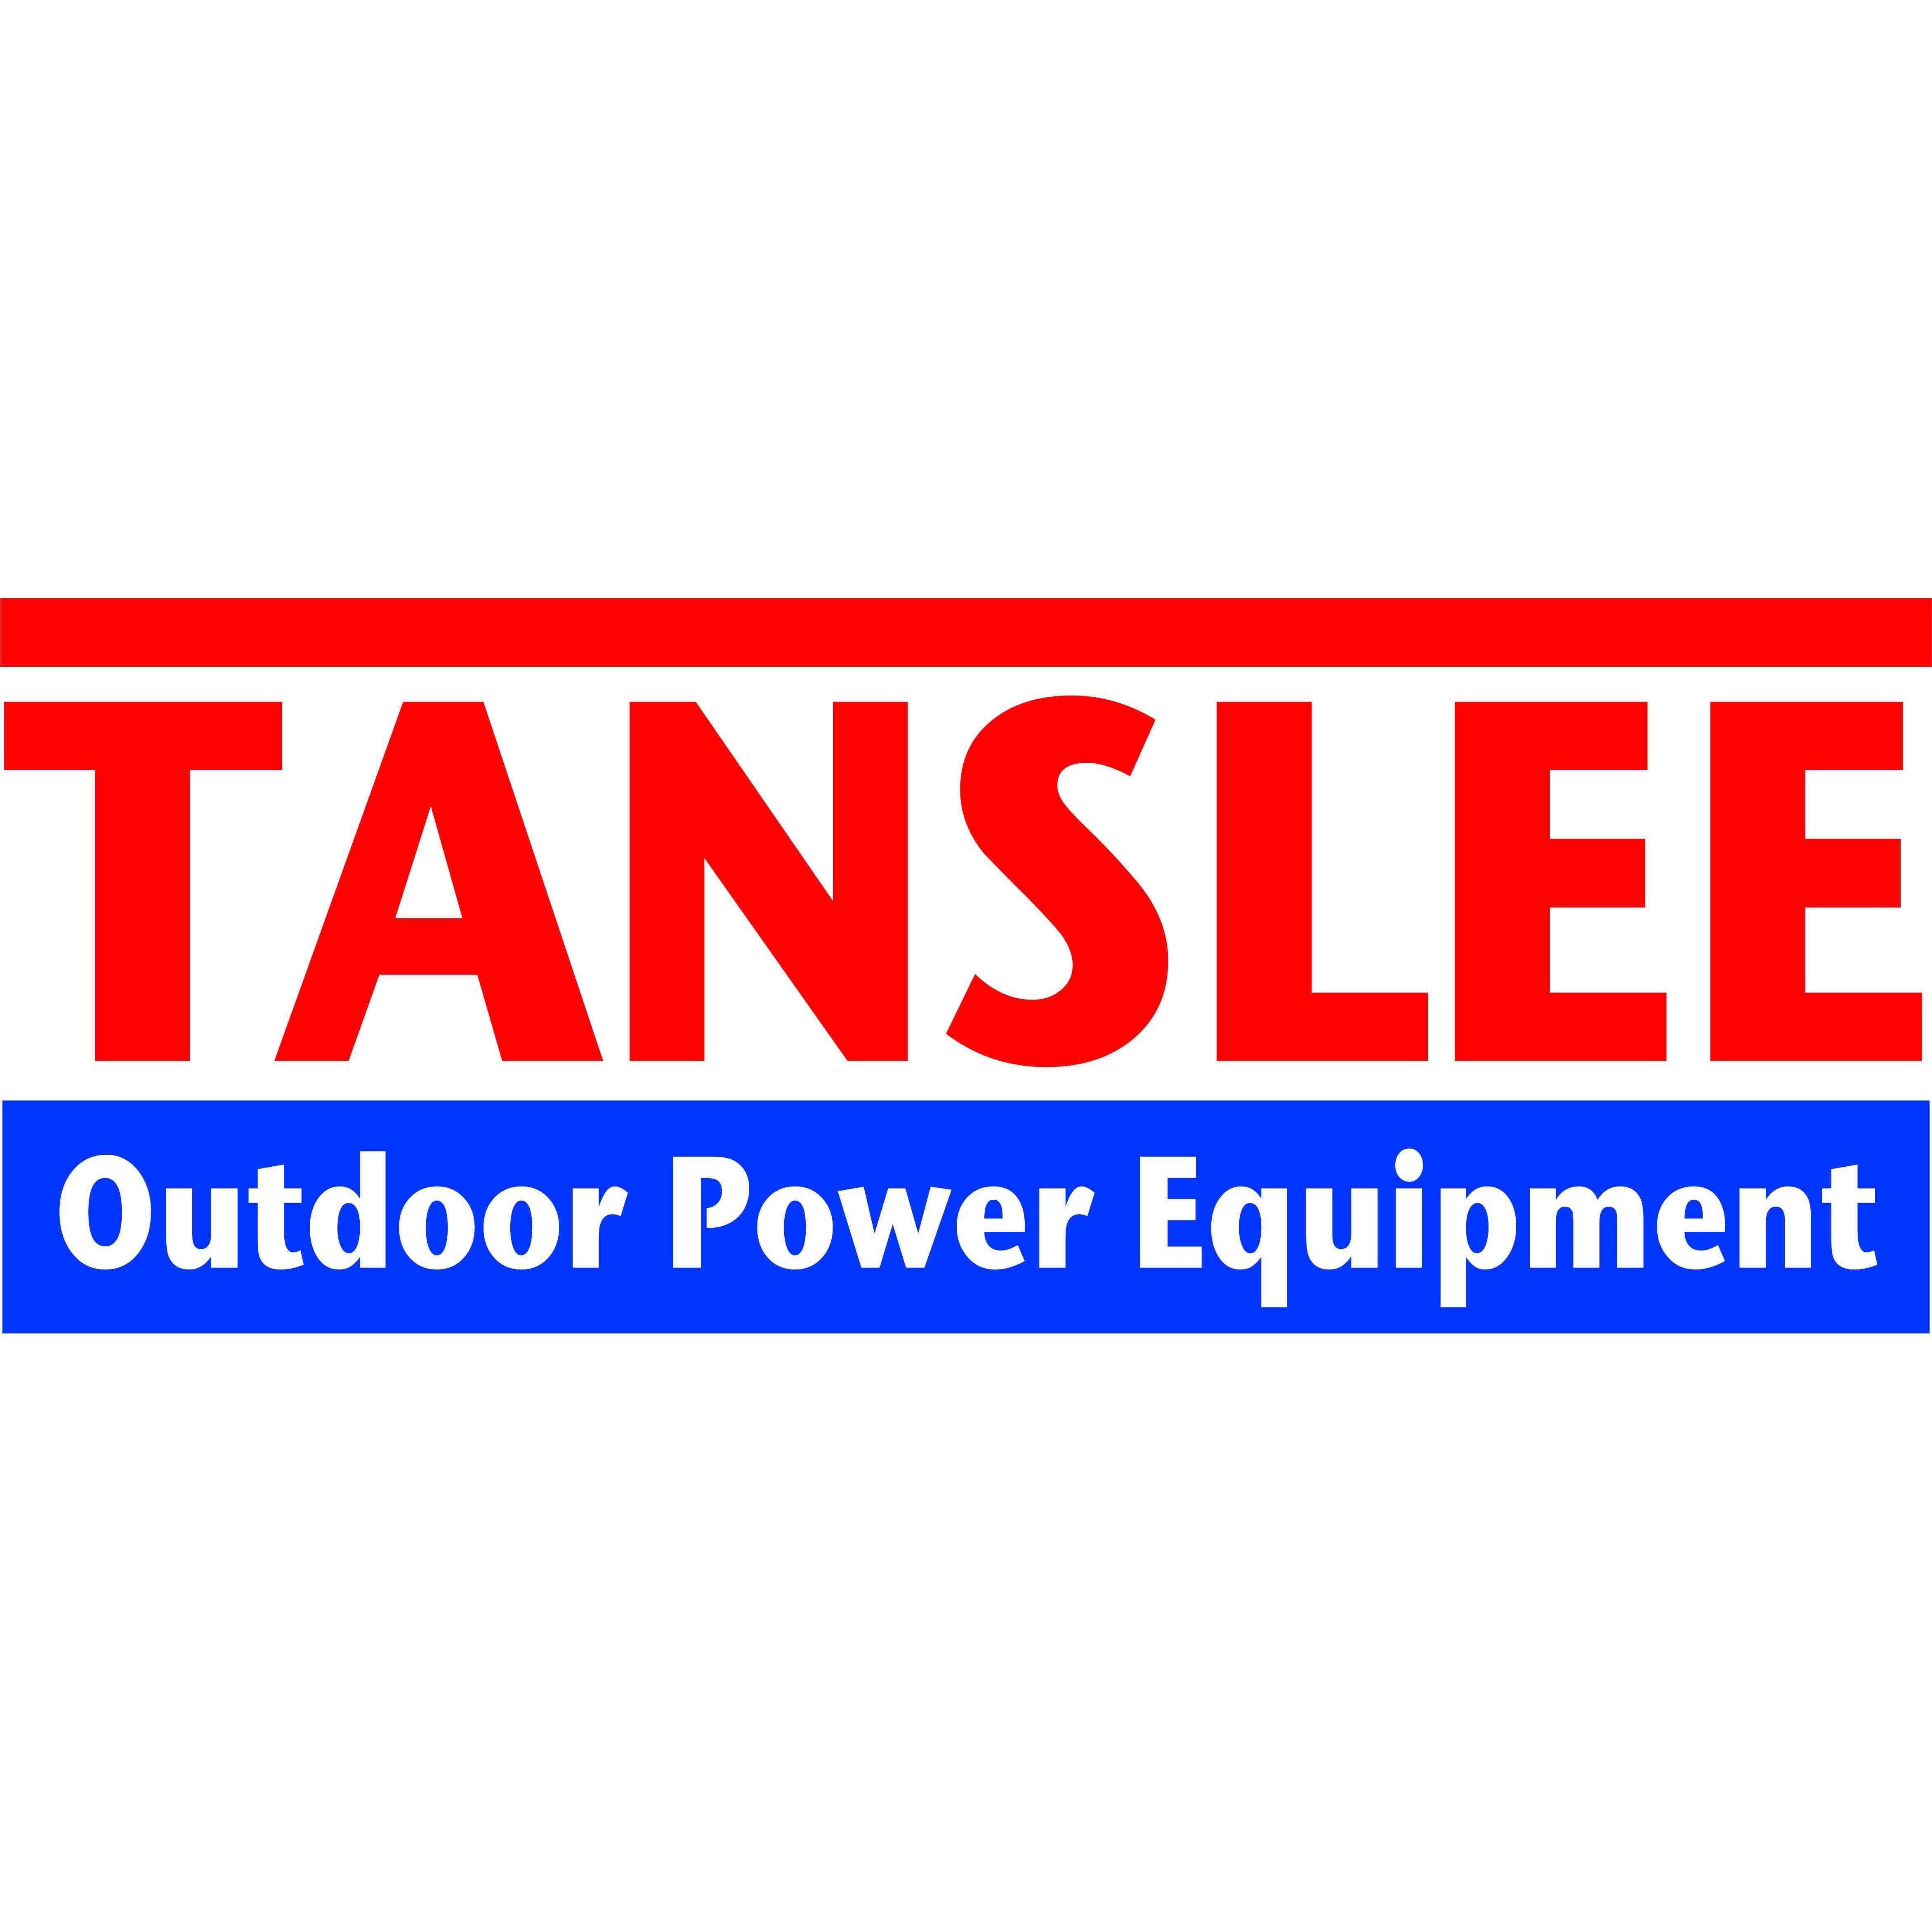 Tanslee Outdoor Power